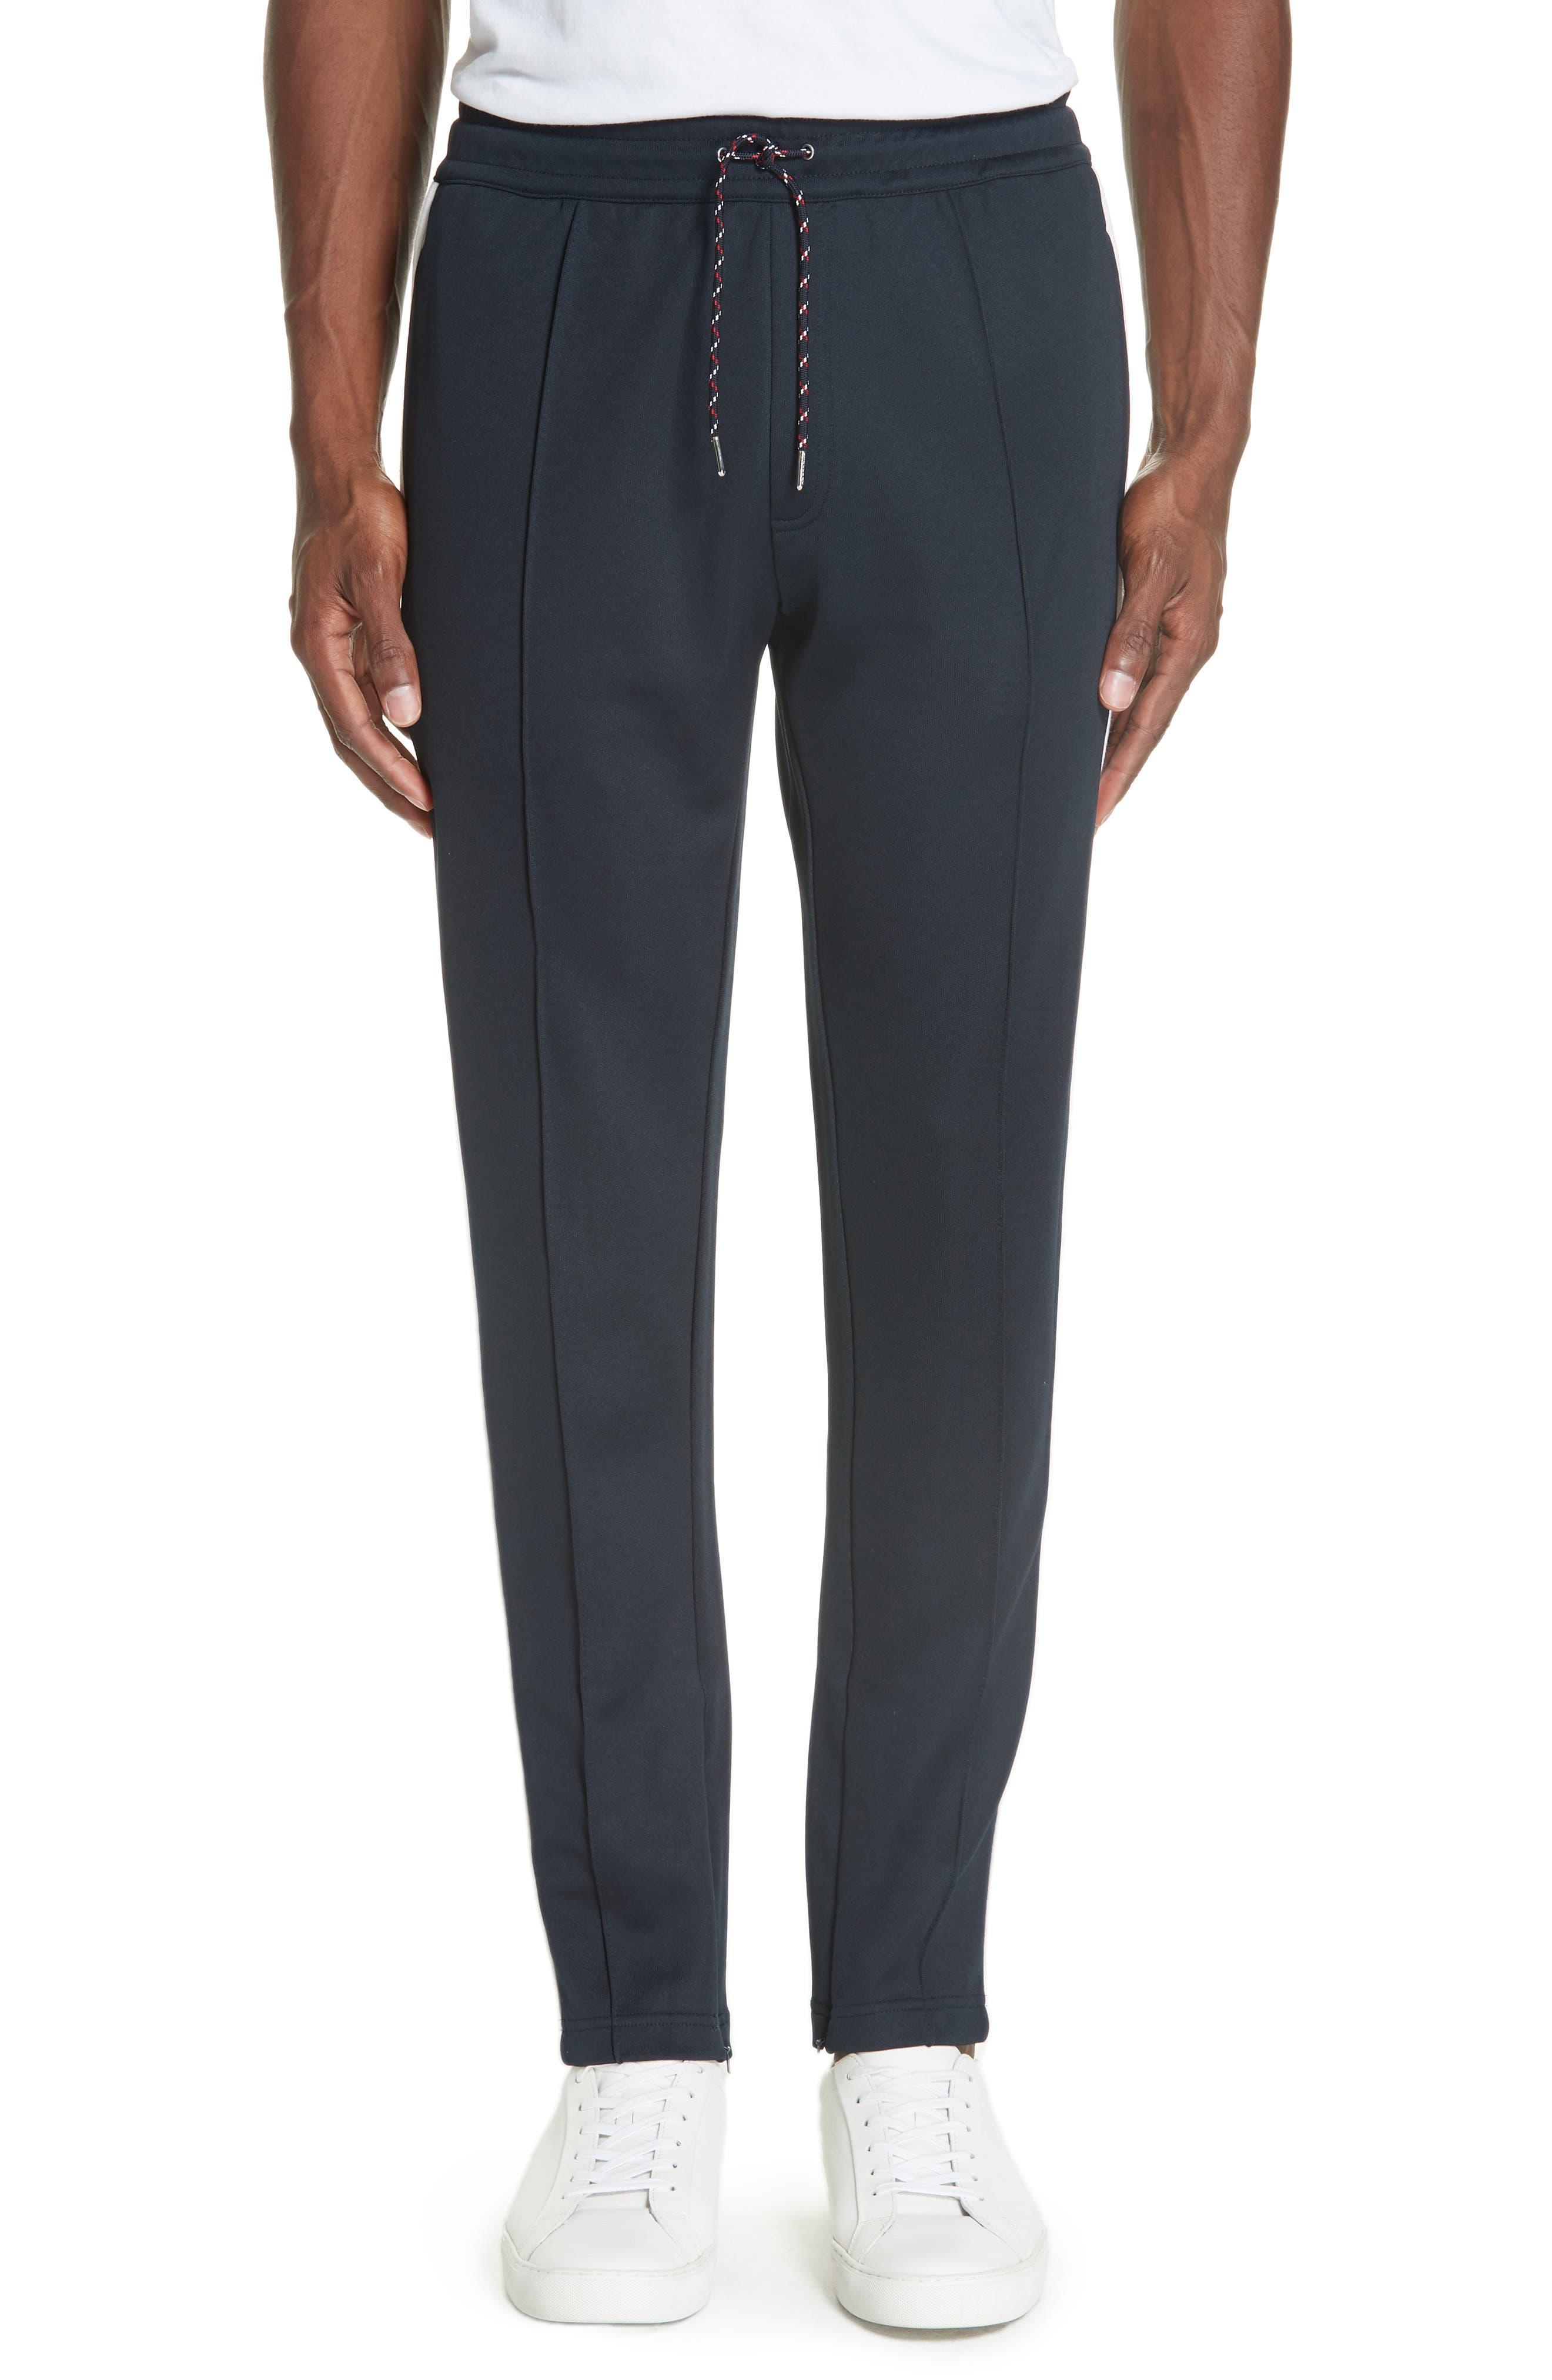 Kaleford Sweatpants,                         Main,                         color, NAVY